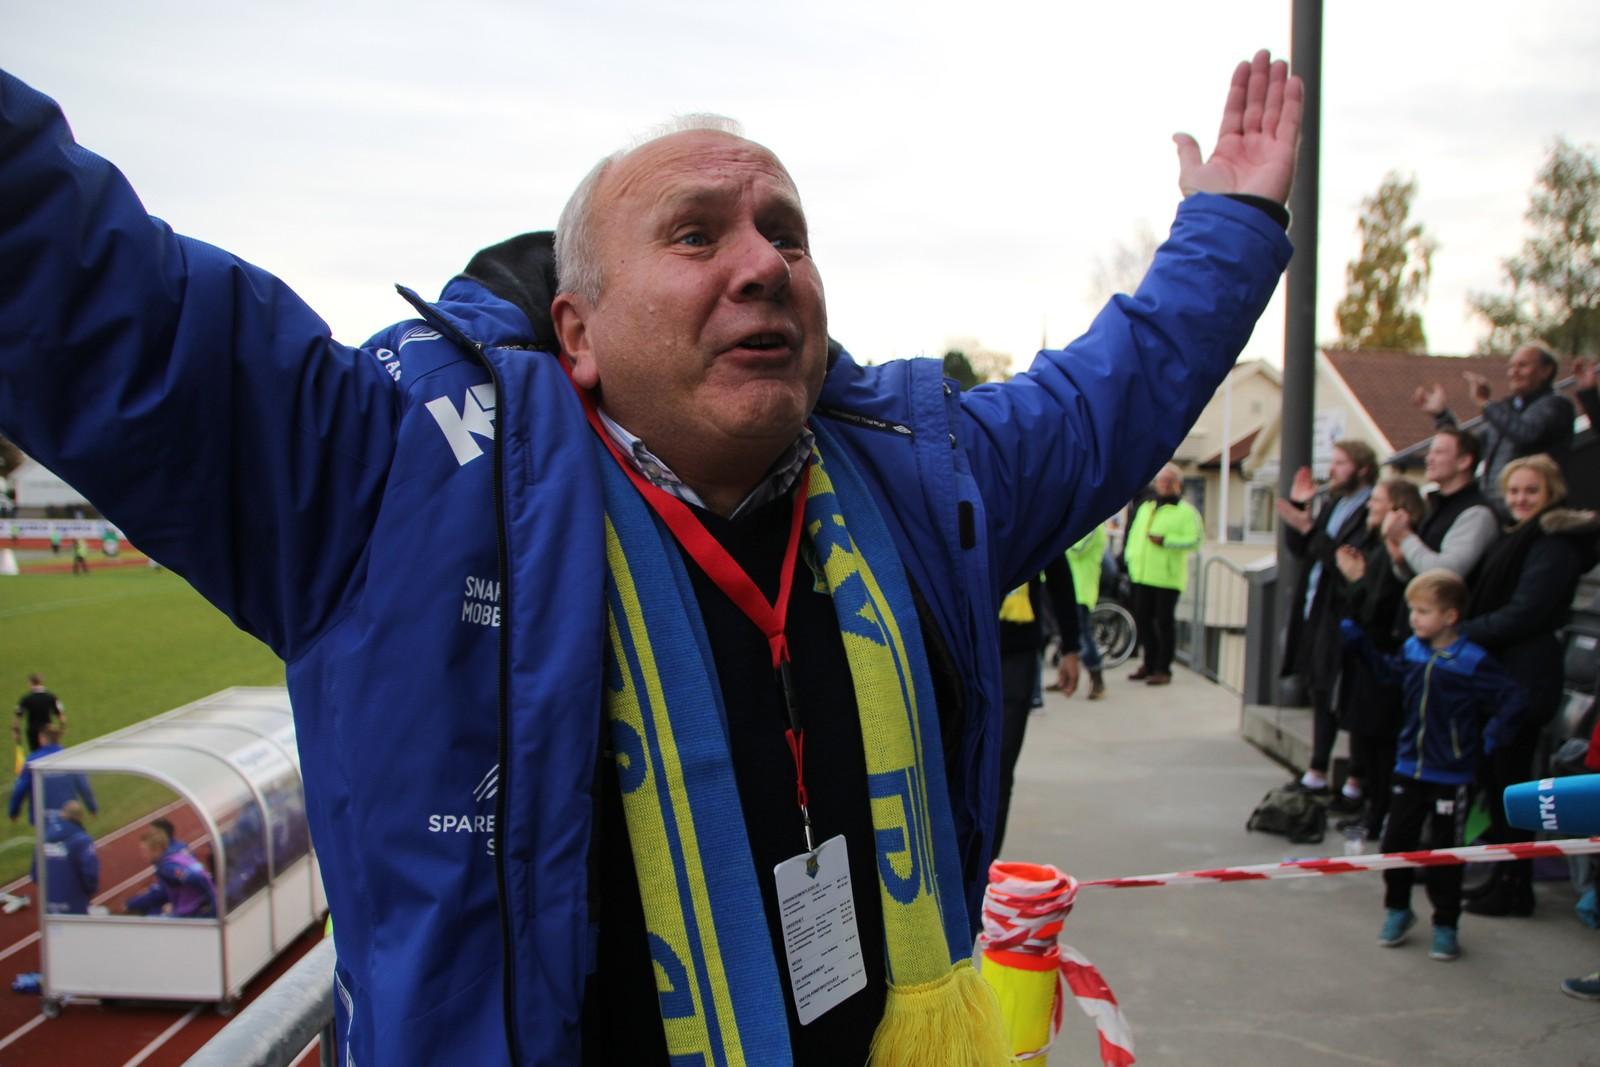 Styreleiar i Jerv Per Gunnar Topland jublar for kvalifiseringsplass.